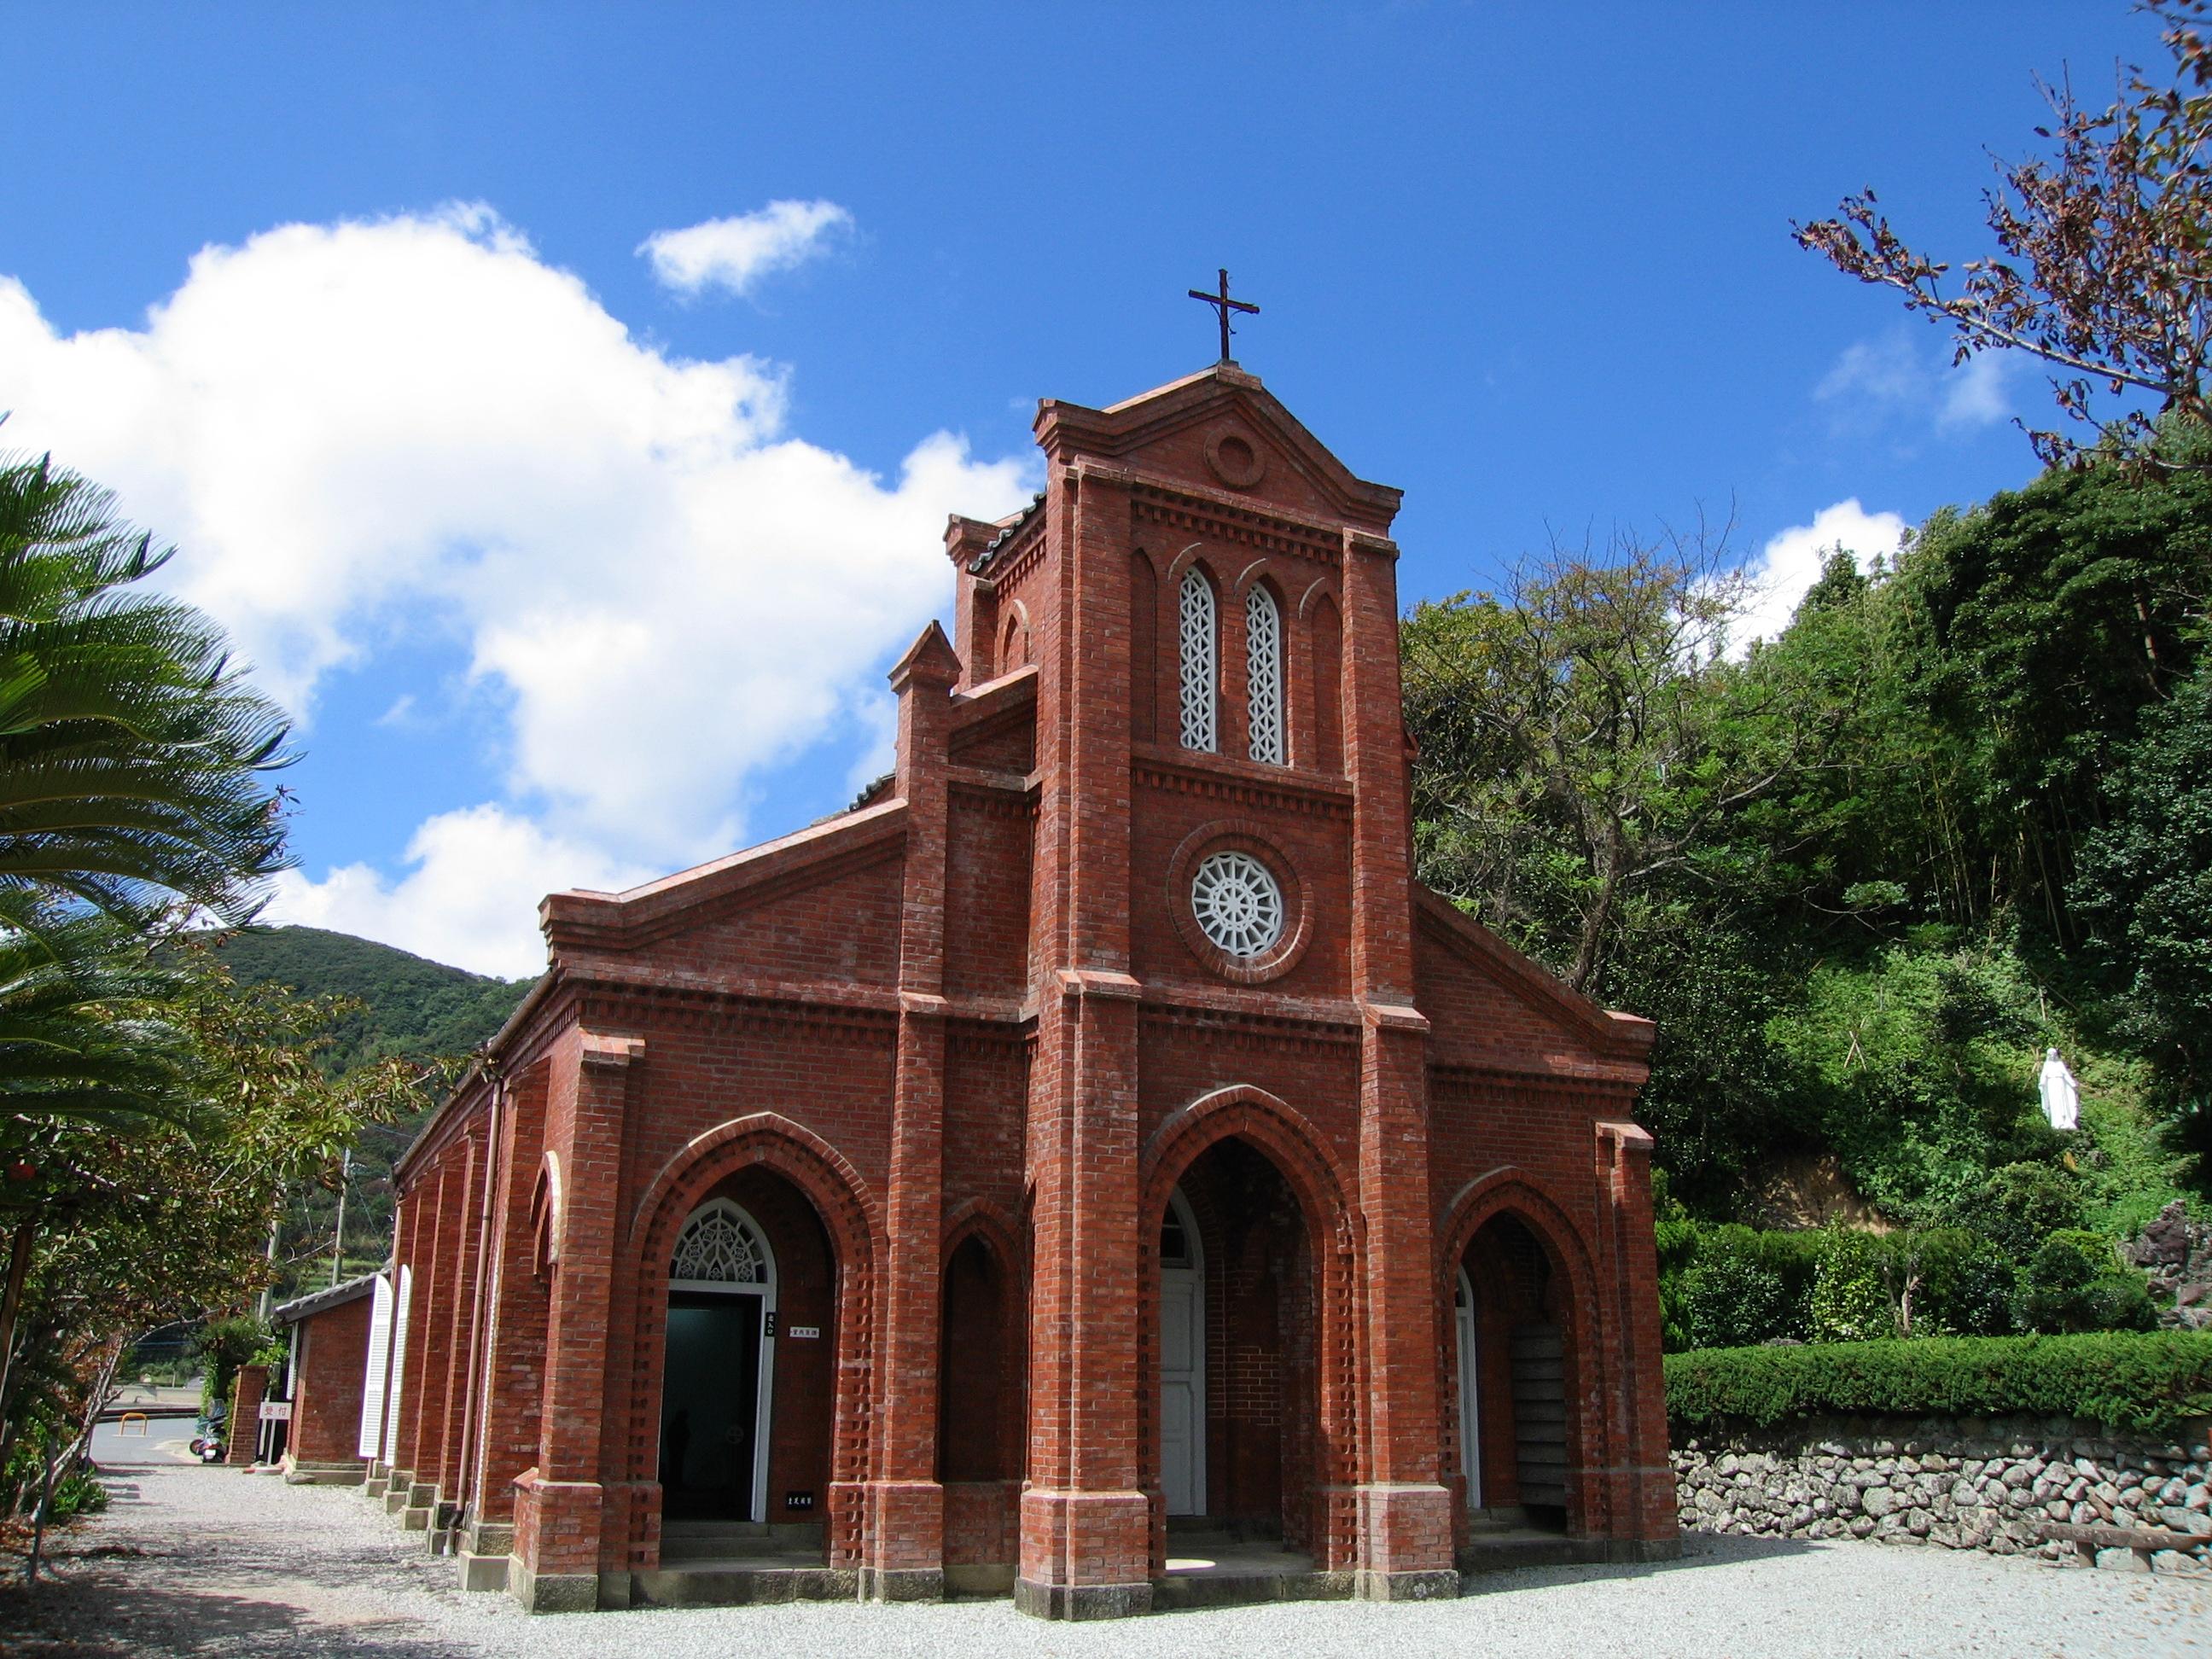 http://upload.wikimedia.org/wikipedia/commons/2/27/Douzaki_Church_in_Nagasaki.JPG